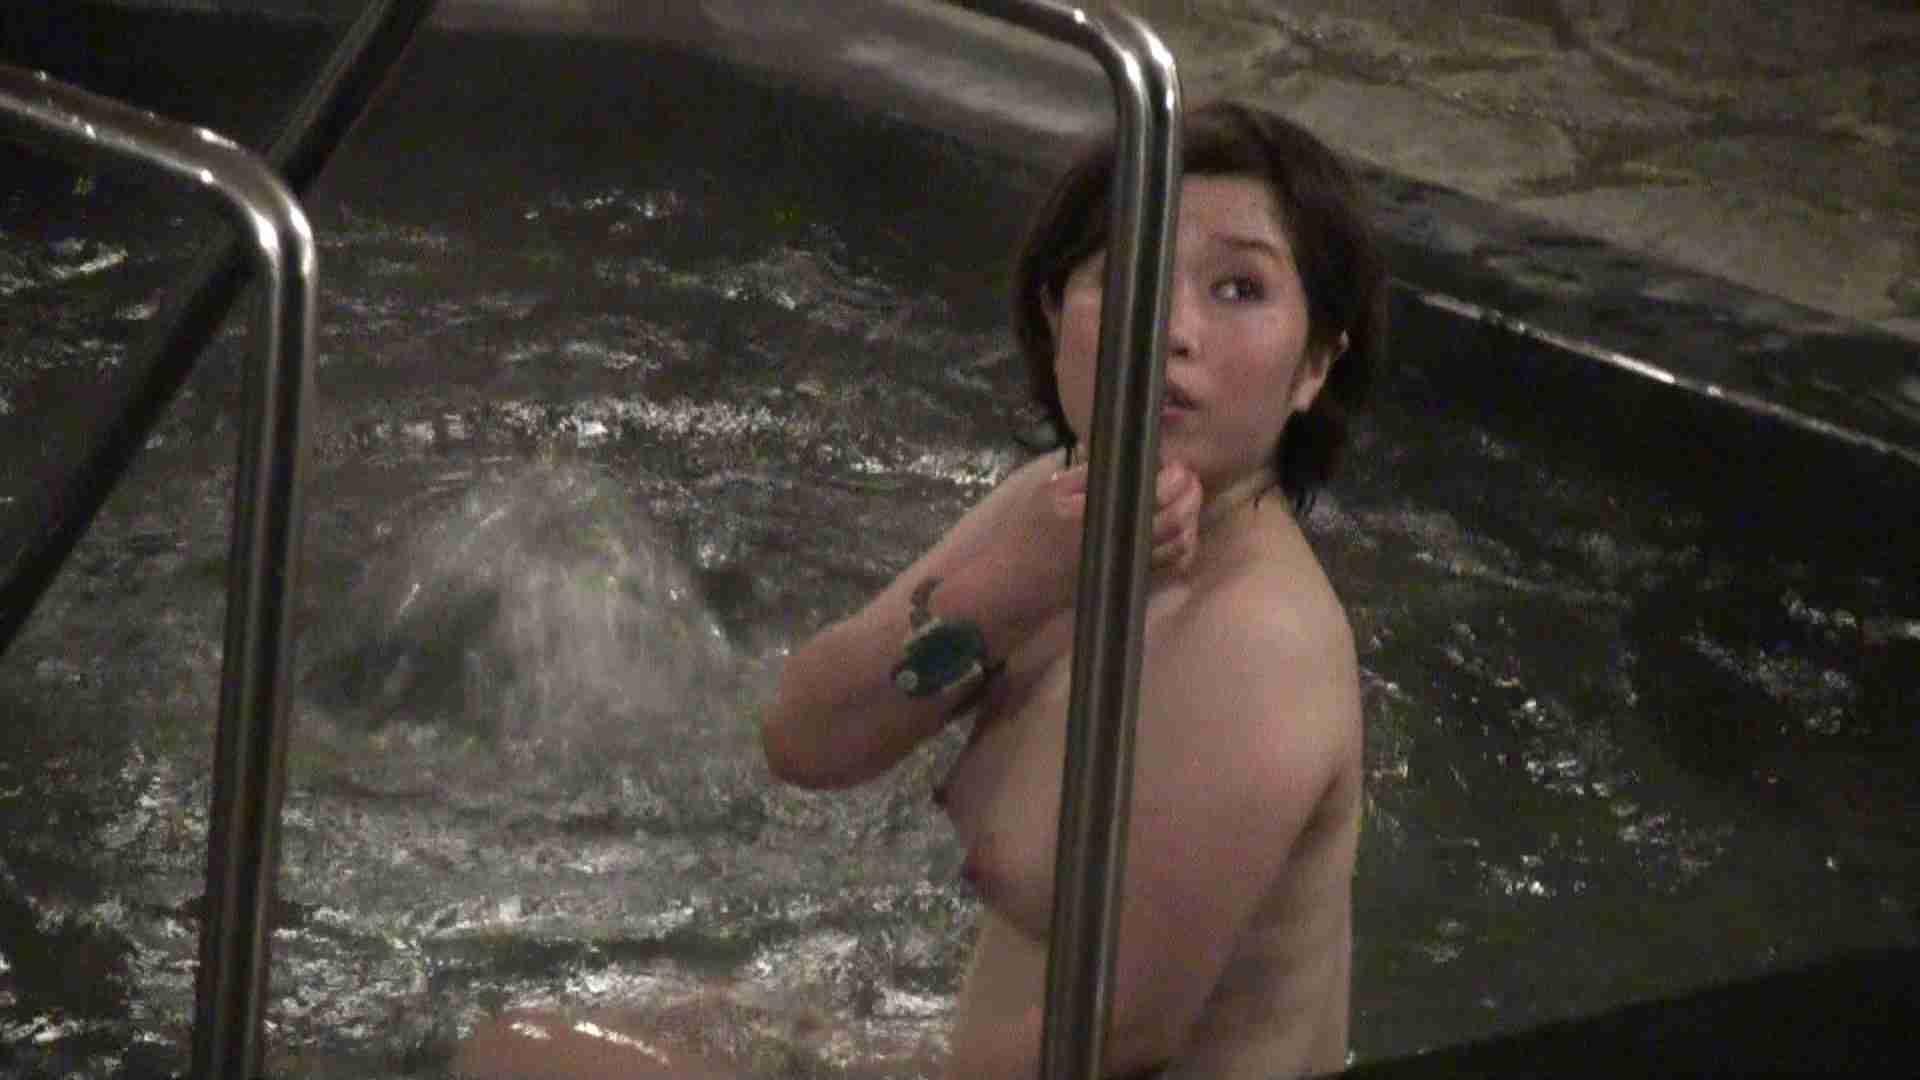 Aquaな露天風呂Vol.432 露天 アダルト動画キャプチャ 86PICs 59